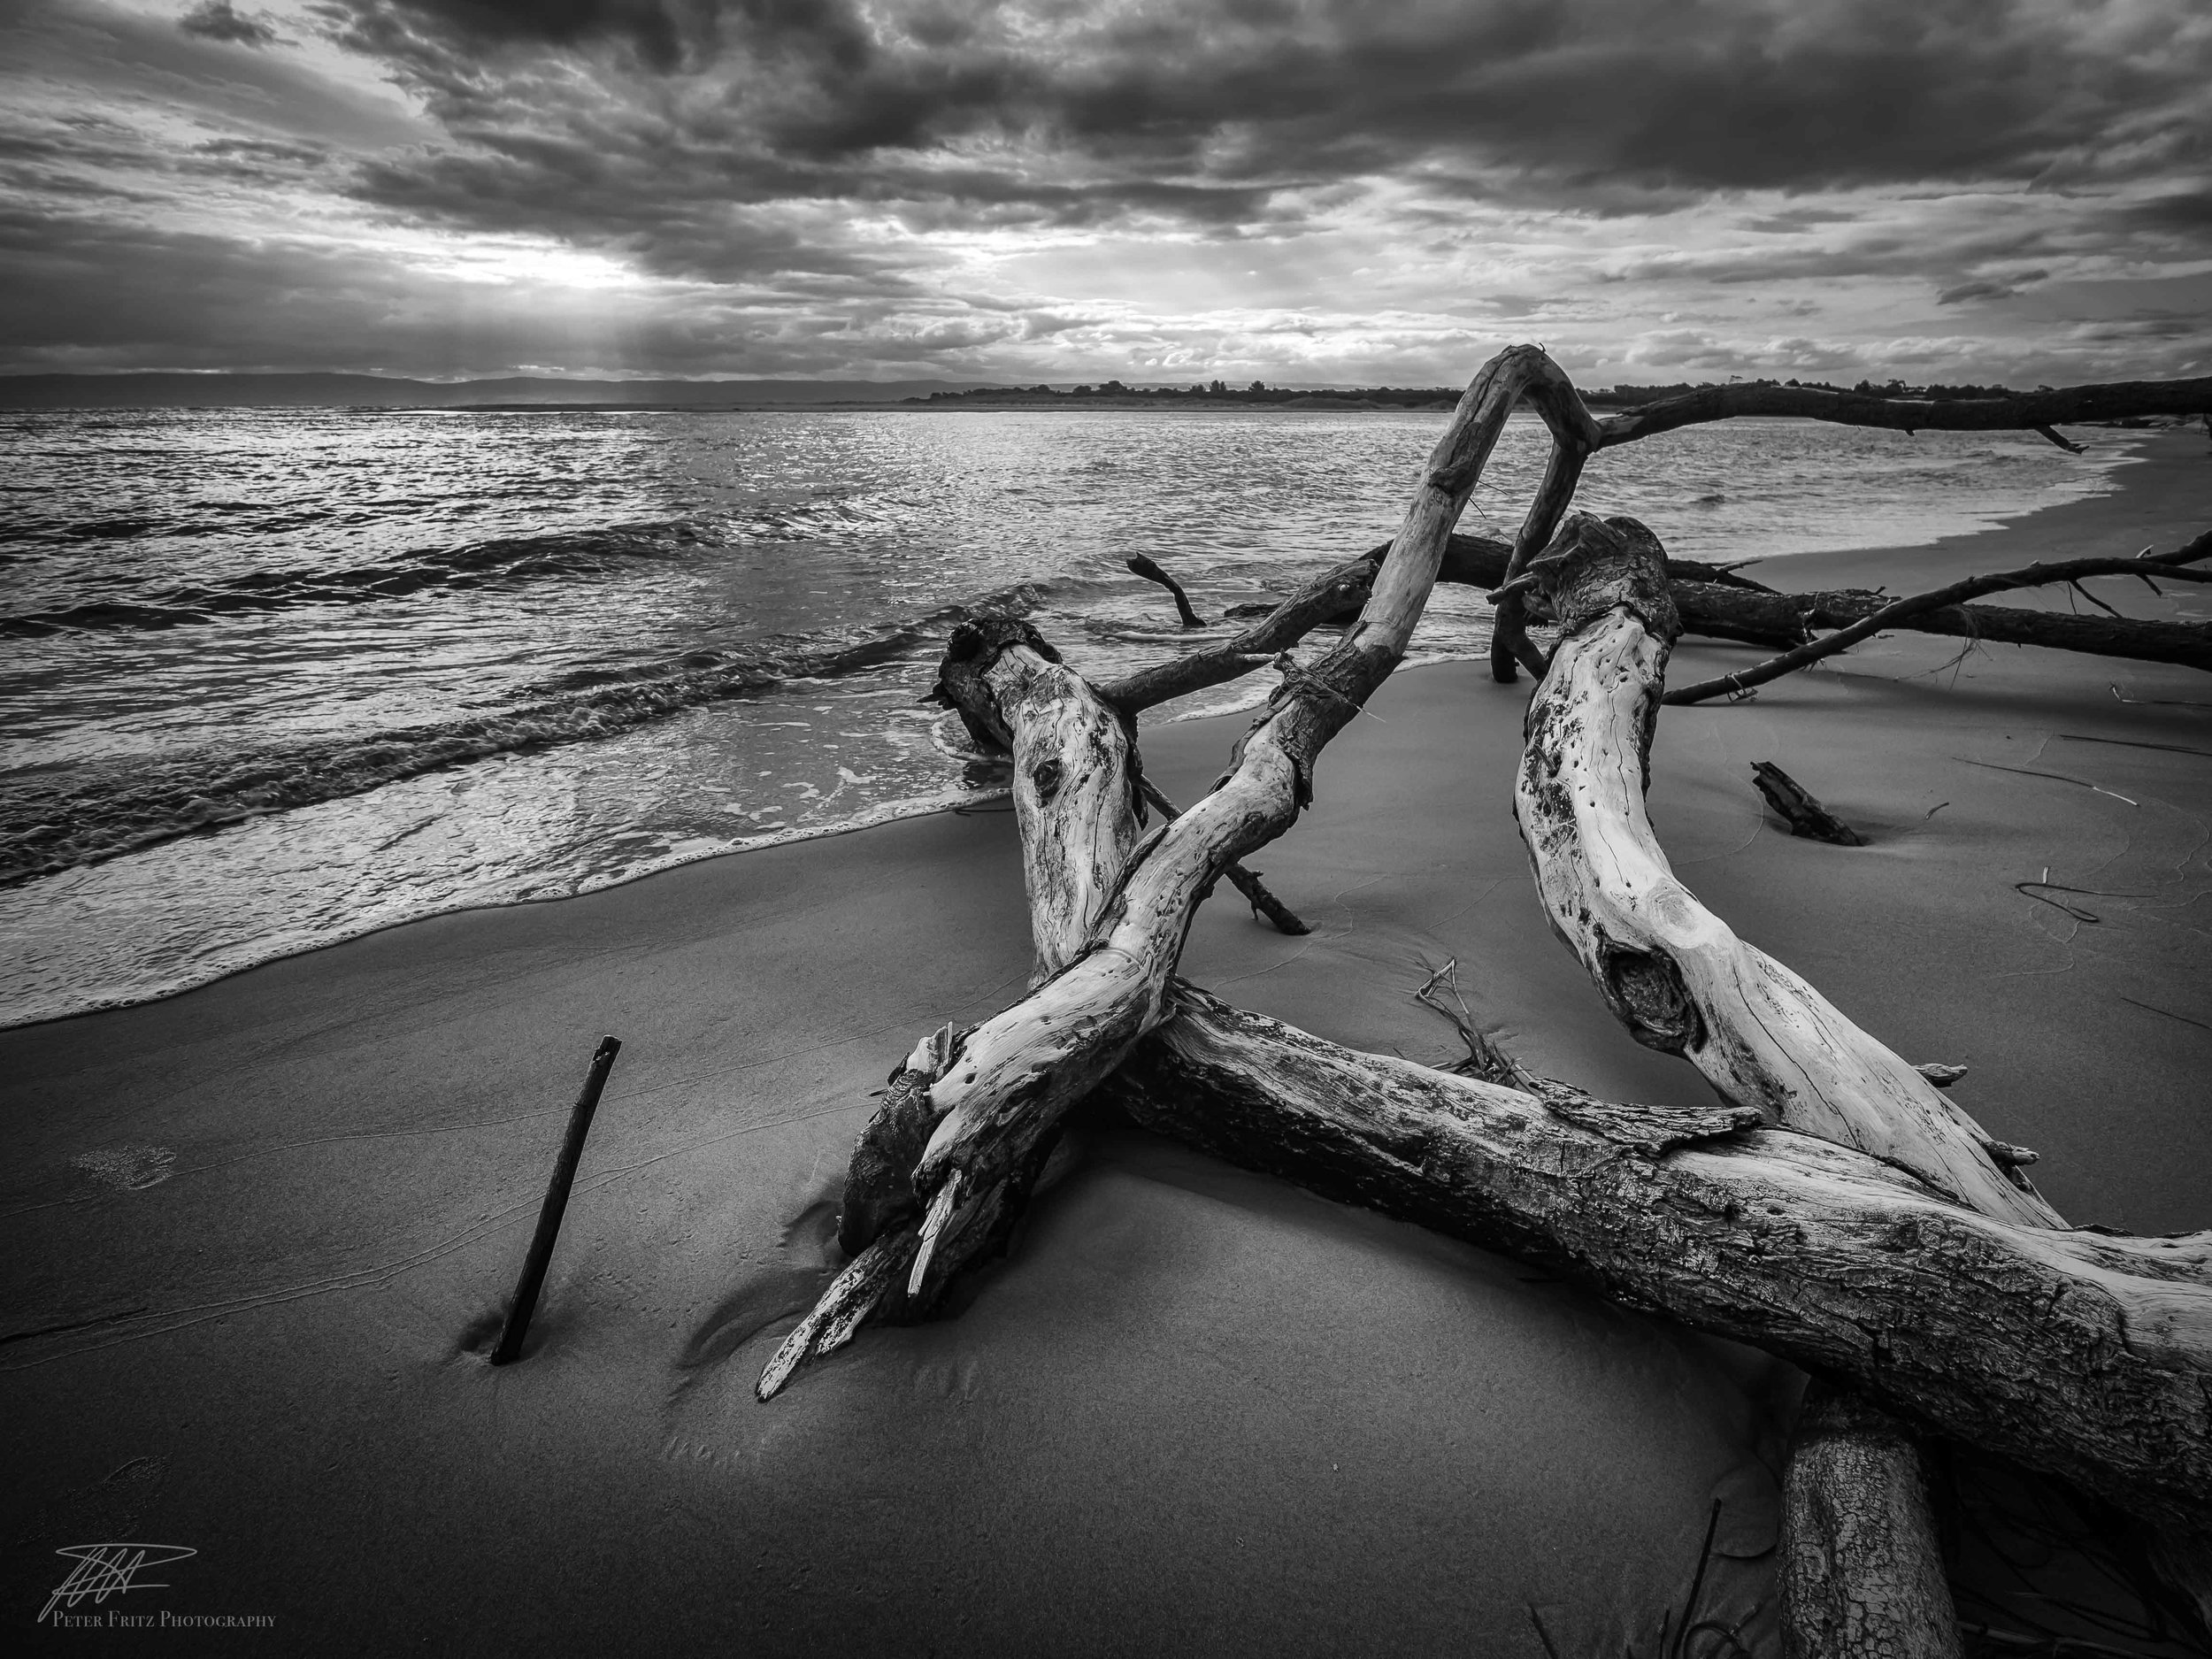 Sticks On Beach 4x3 web.jpg